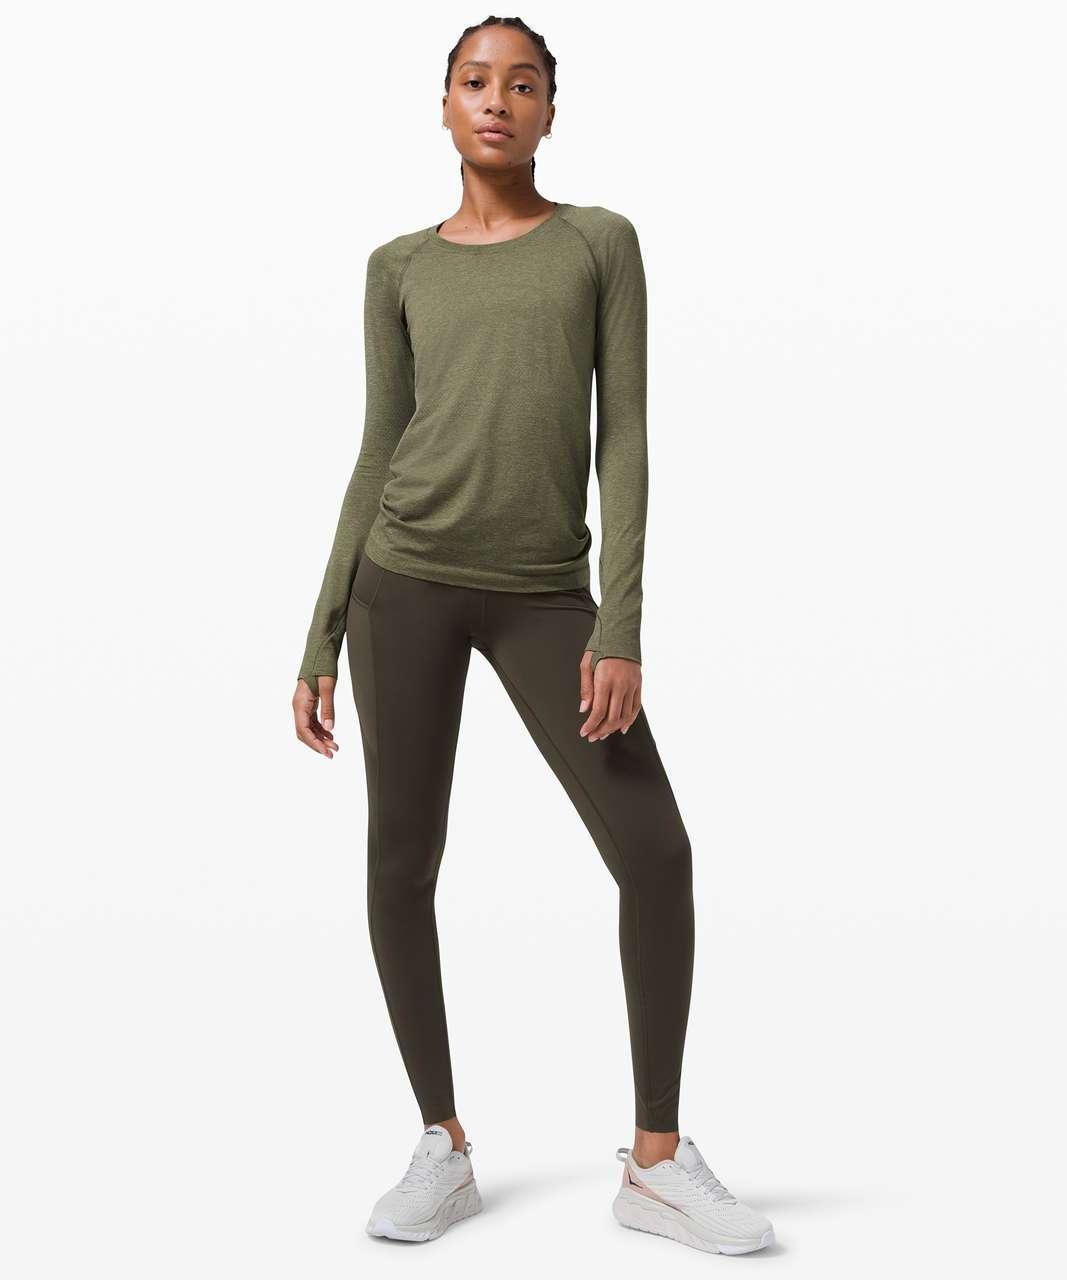 Lululemon Swiftly Tech Long Sleeve 2.0 - Willow Green / Army Green